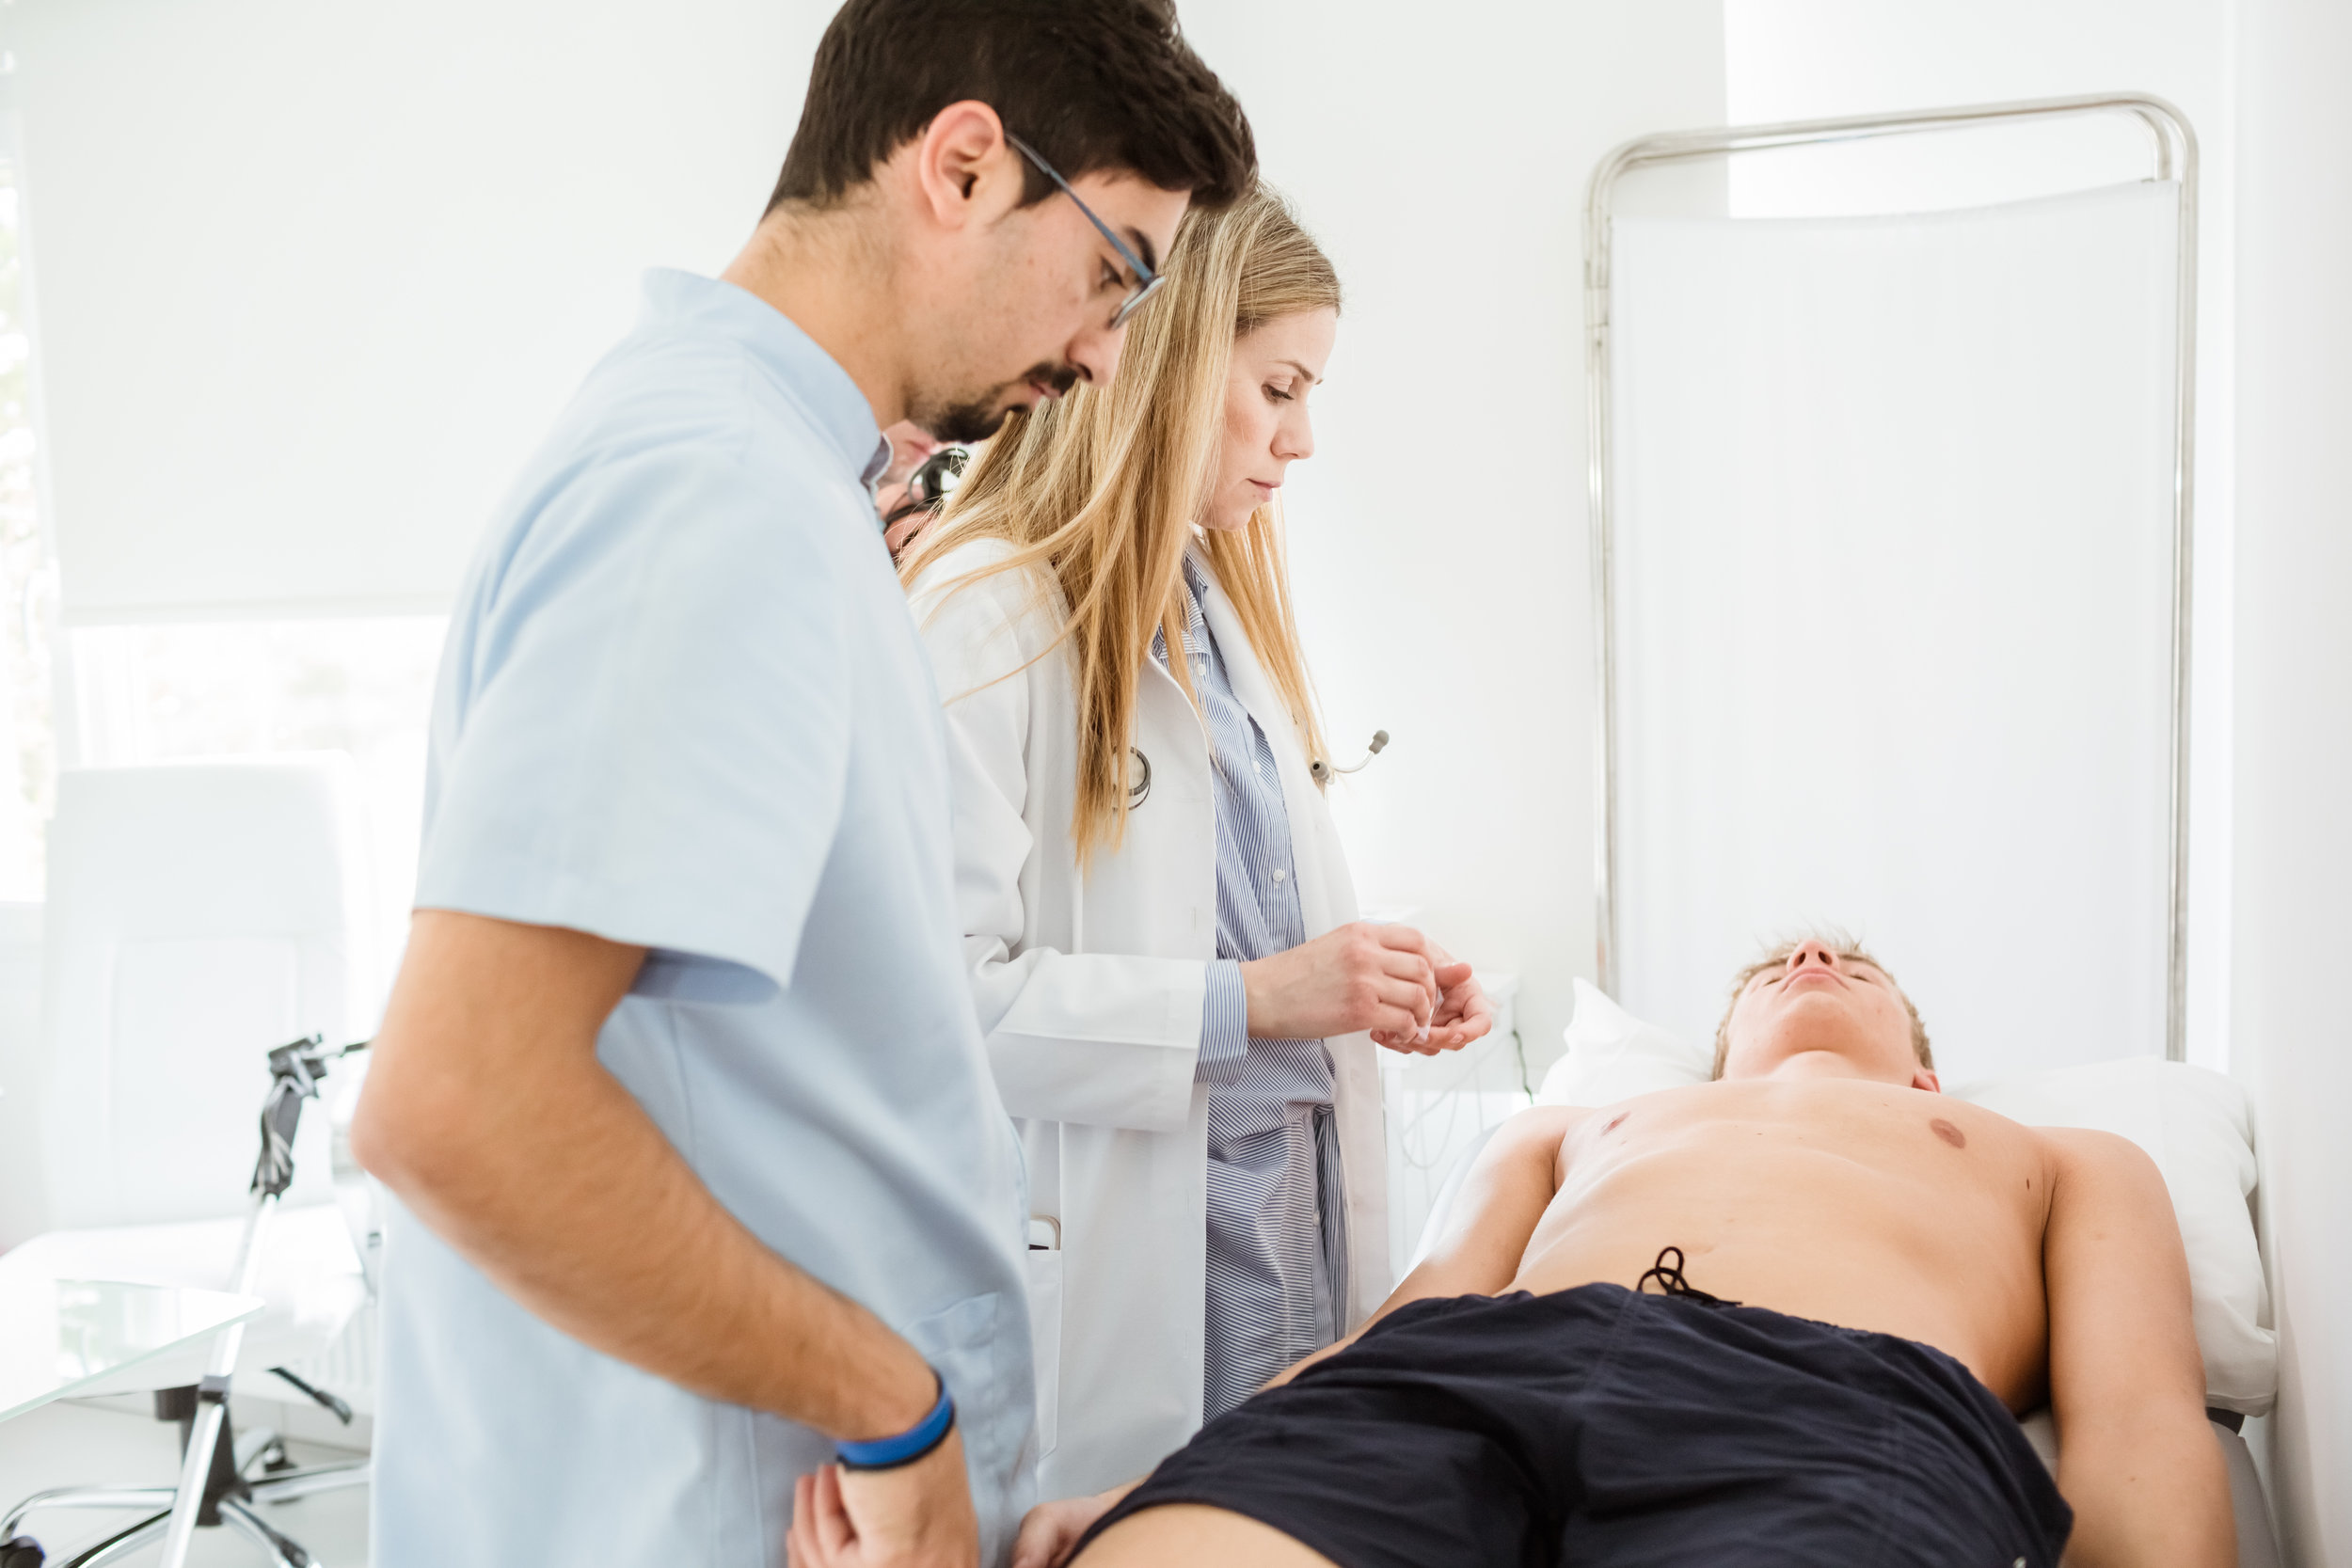 athlete-rehabilitation-medical-exam.jpg